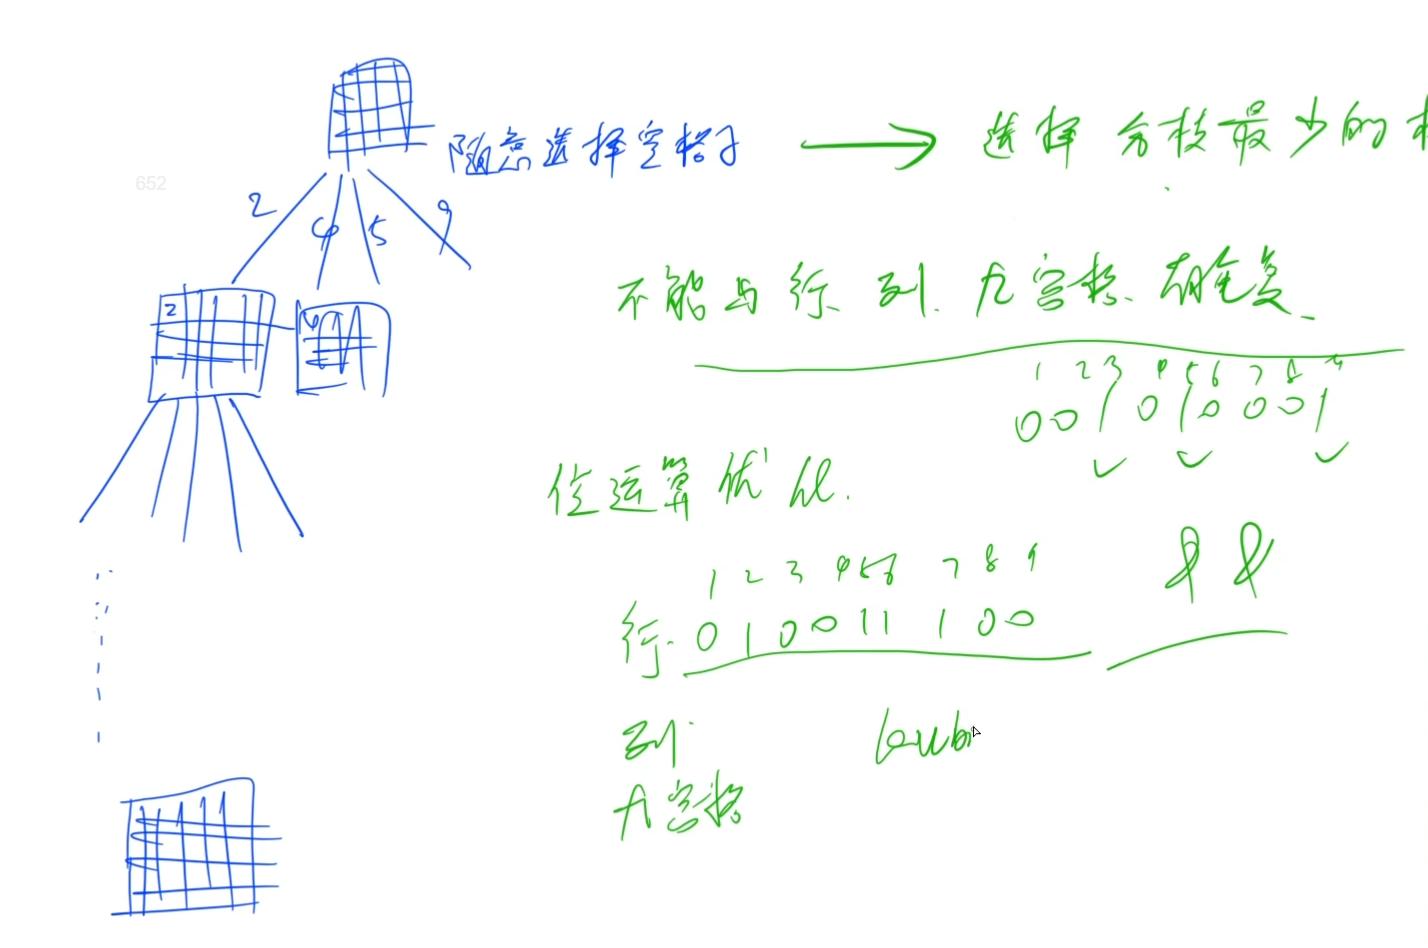 image_14.png